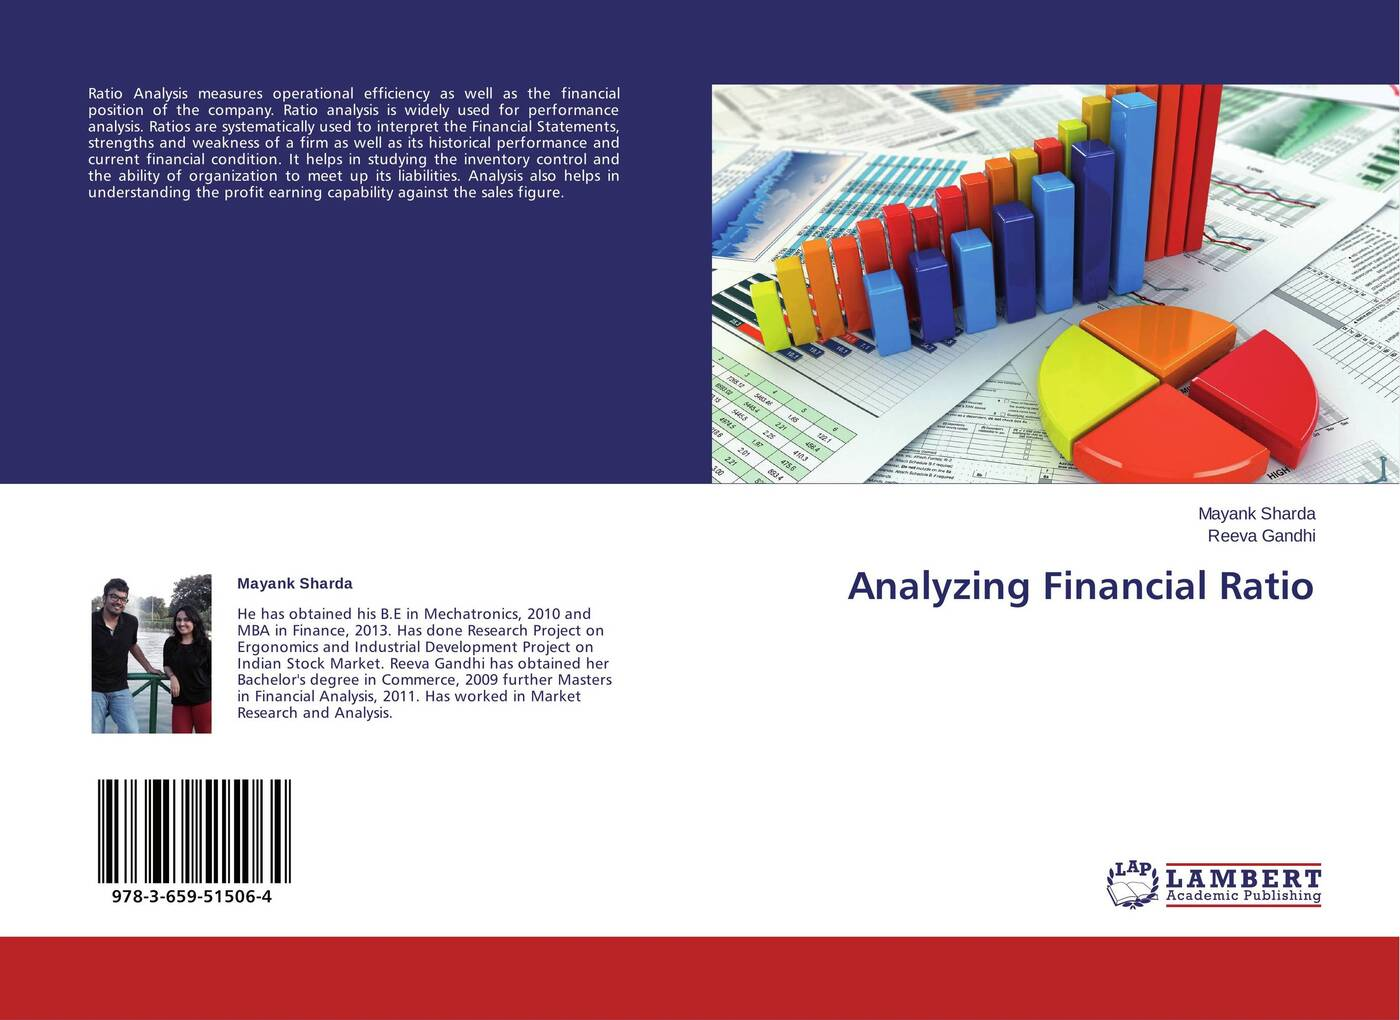 Mayank Sharda and Reeva Gandhi Analyzing Financial Ratio frank fabozzi j analysis of financial statements